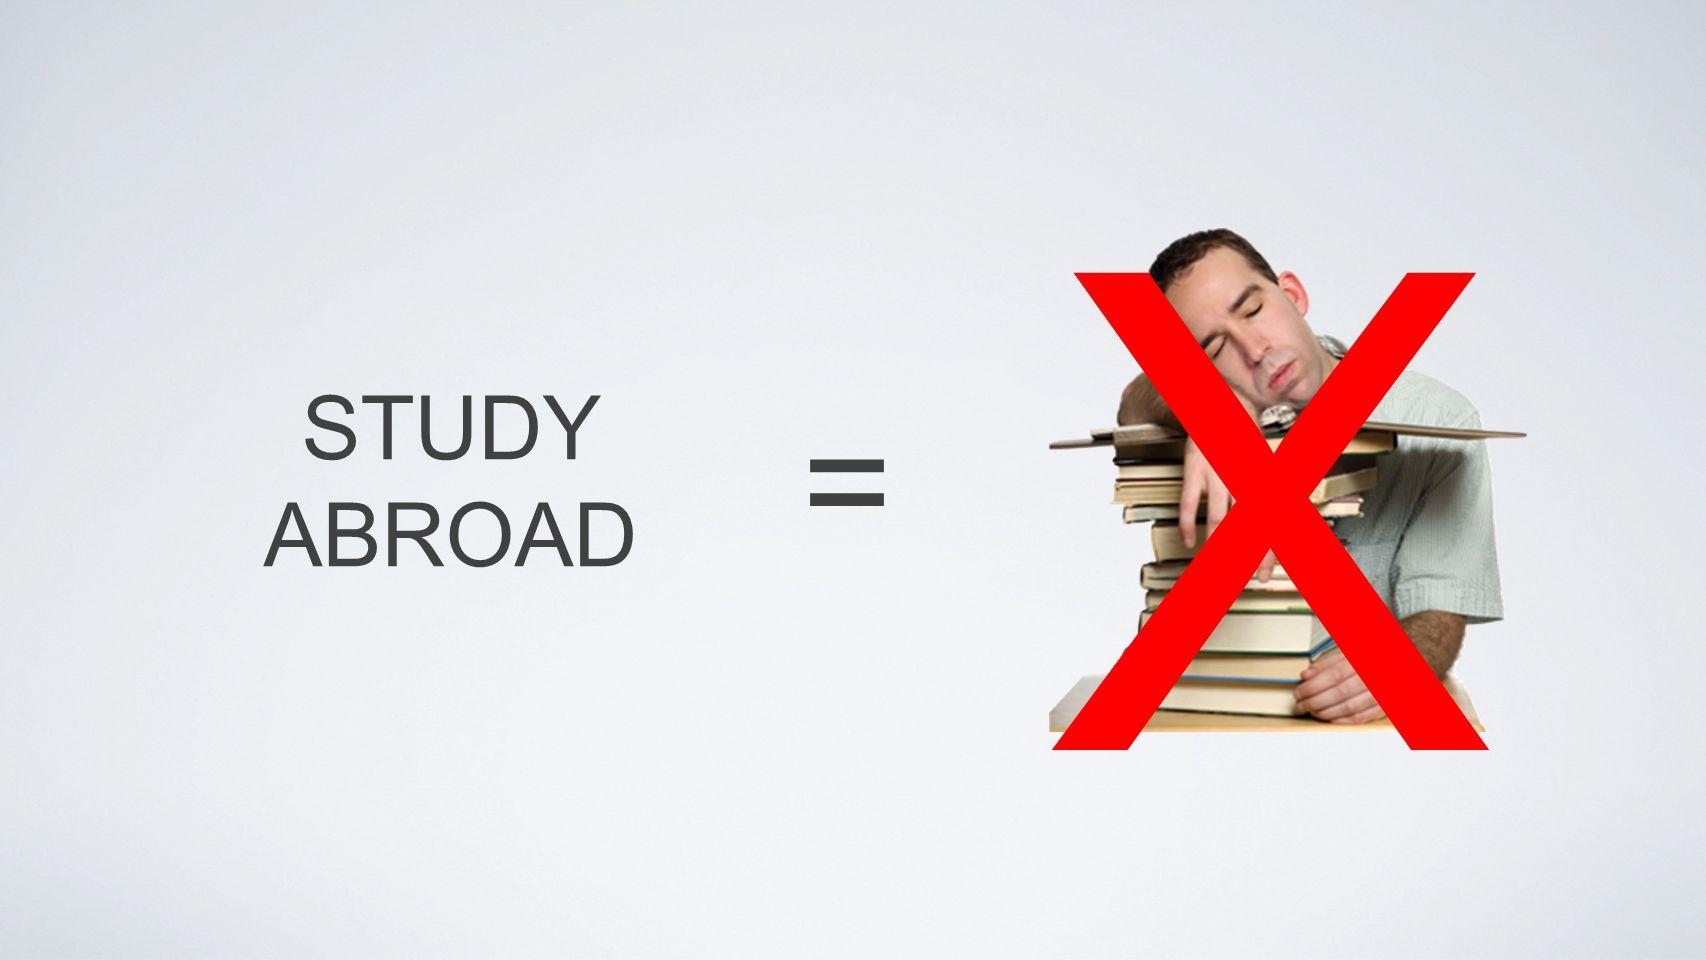 STUDY ABROAD = X